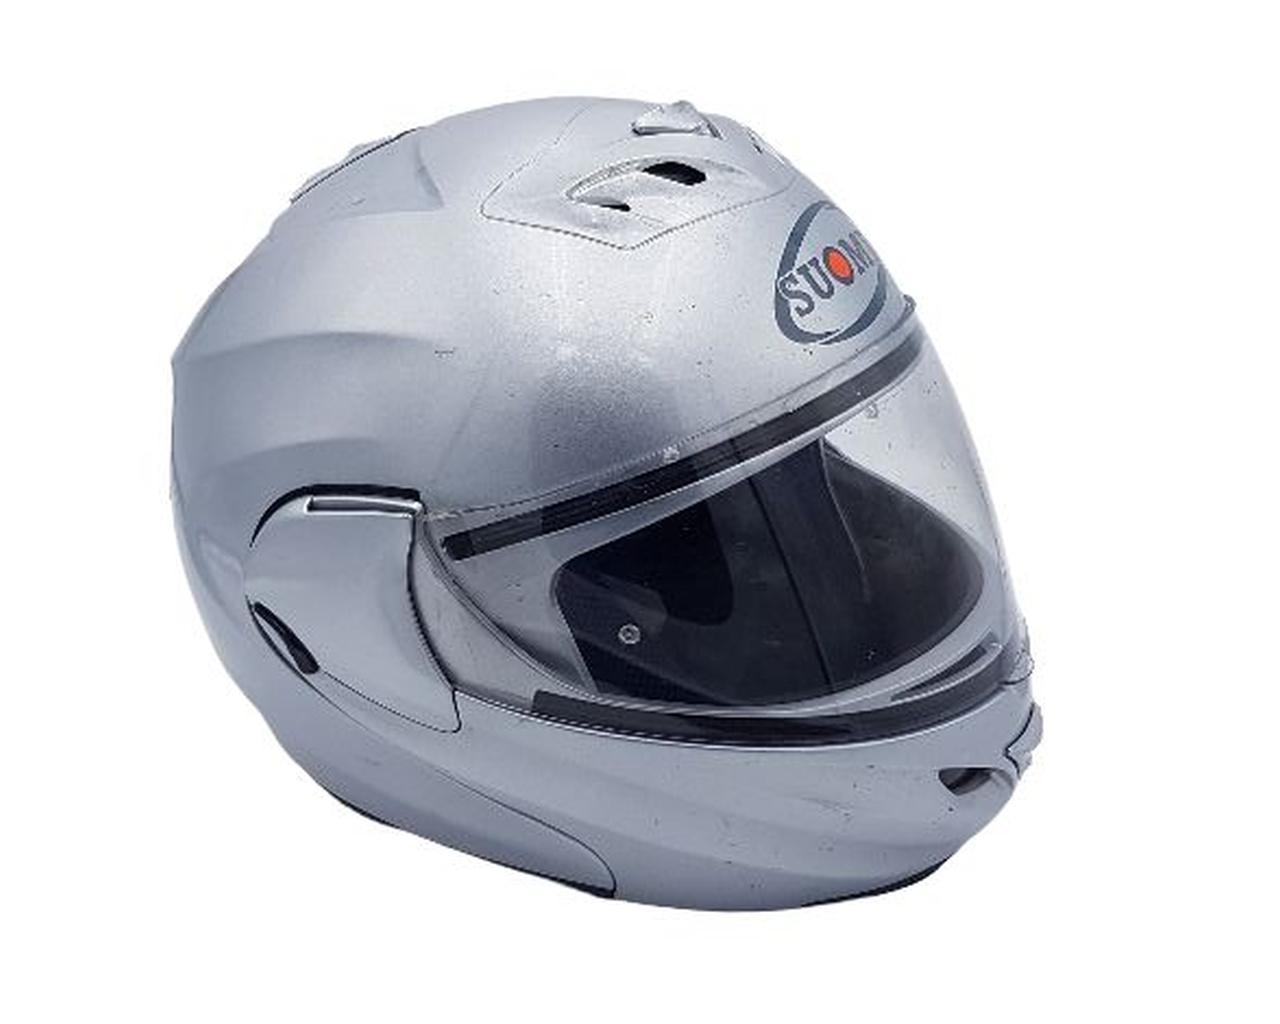 CASCO MOTO MODULARE SUOMY TG. S - USATO